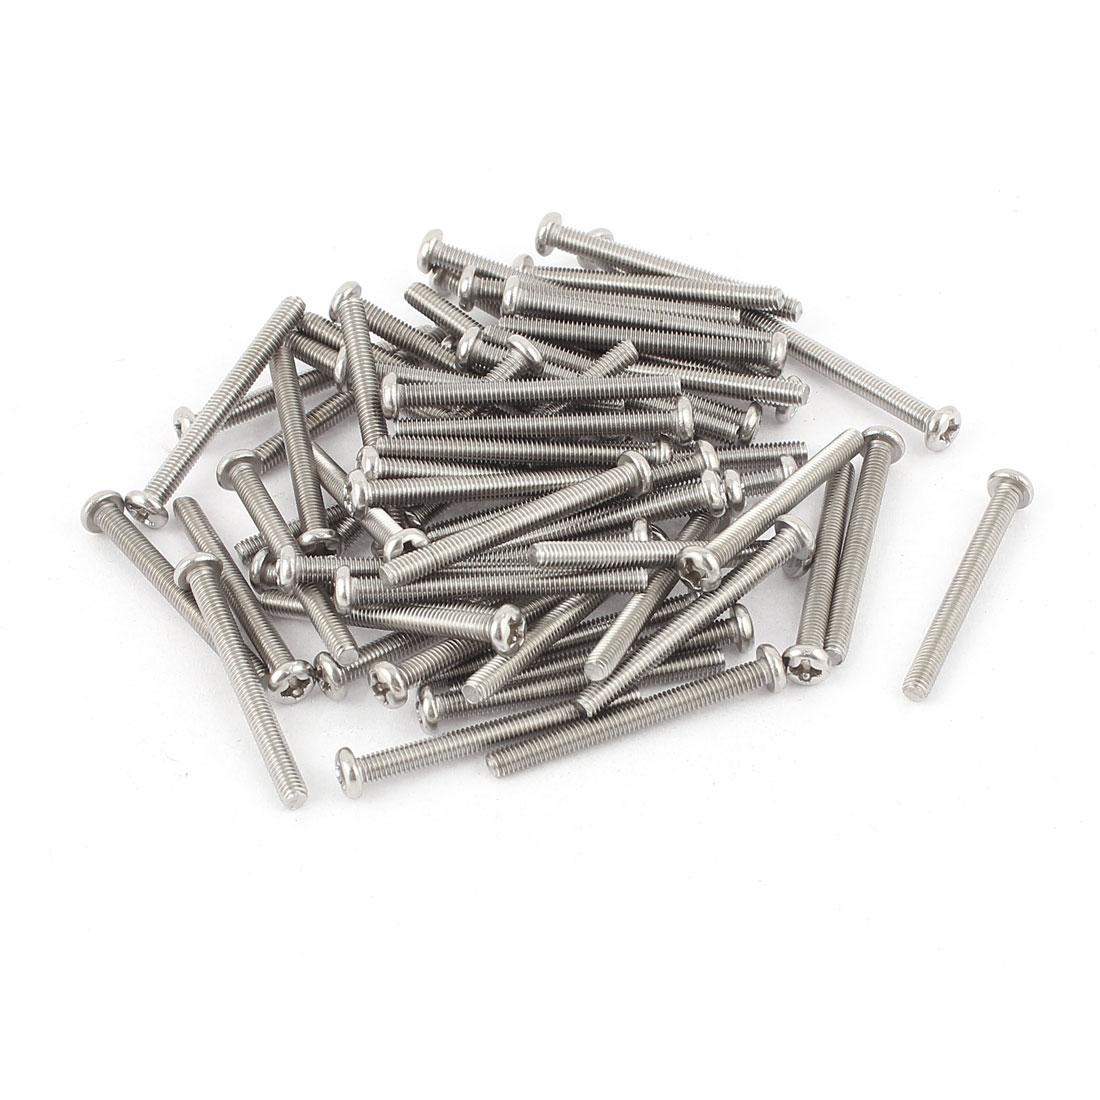 M3 x 30mm 304 Stainless Steel Crosshead Phillips Pan Head Screws Bolt 60pcs